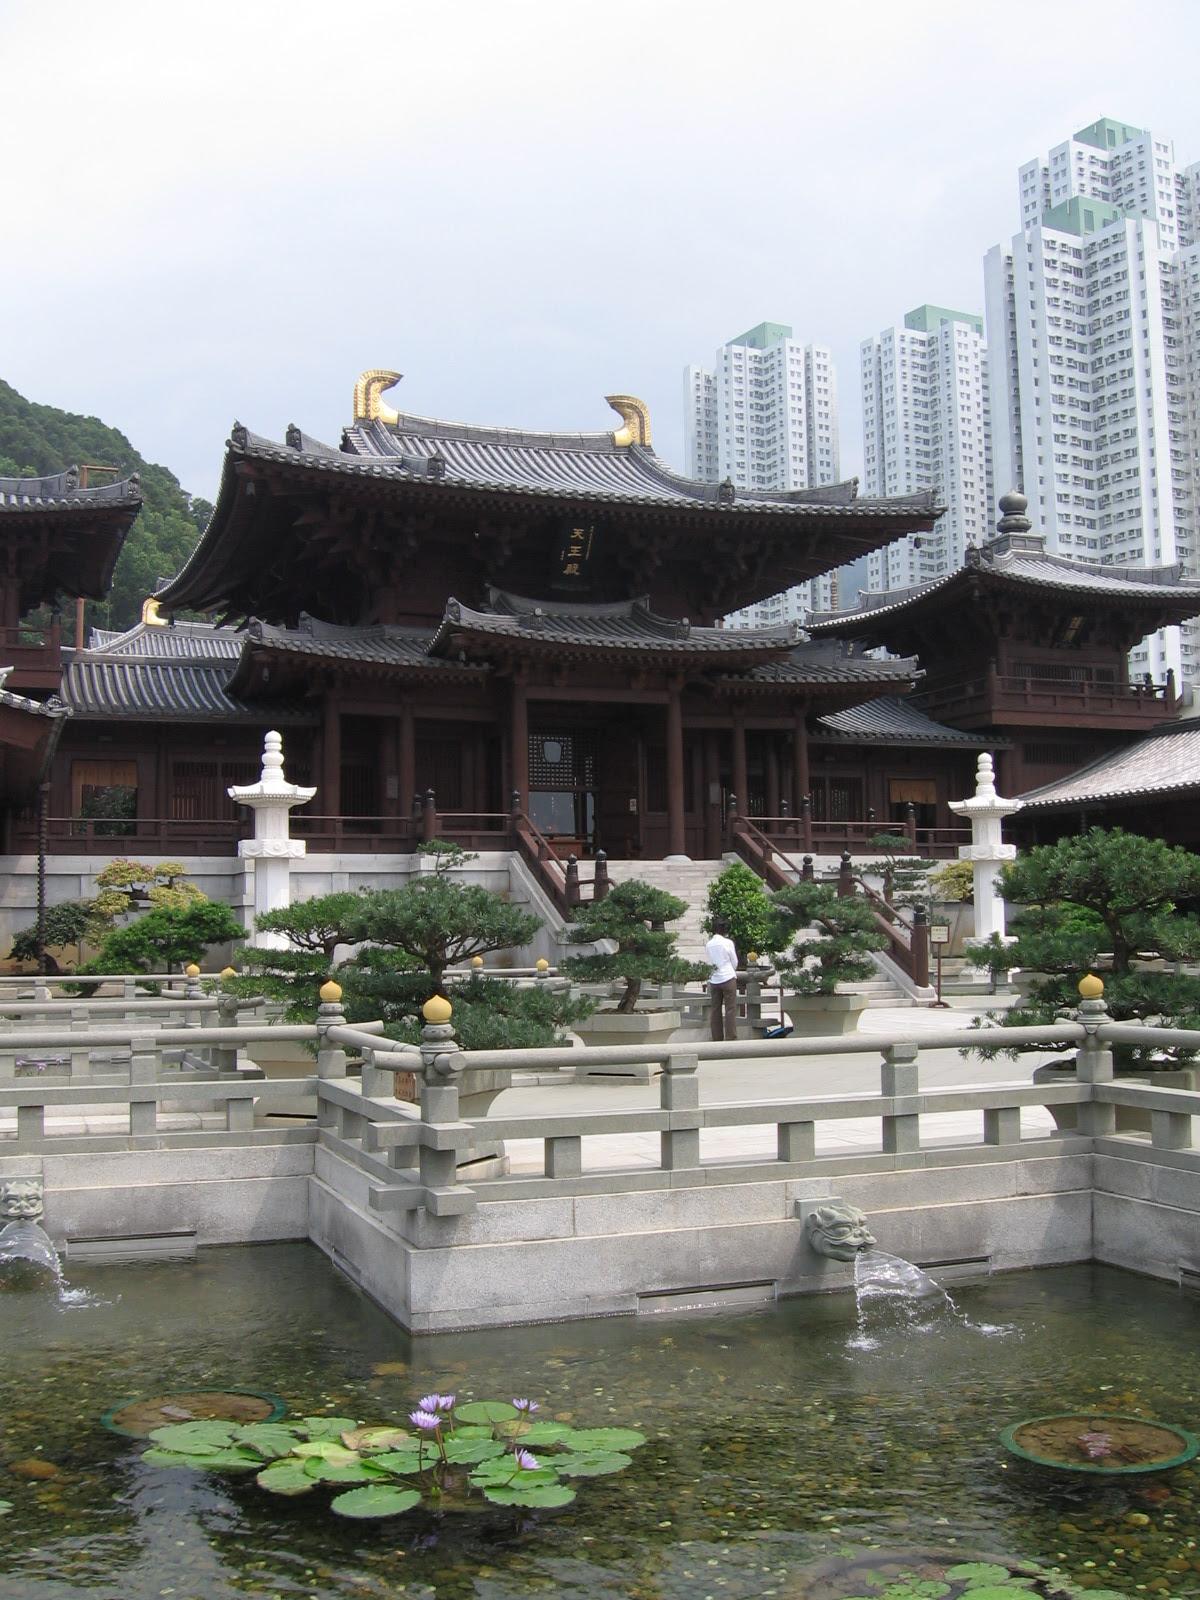 http://upload.wikimedia.org/wikipedia/commons/4/4c/Chi_Lin_Nunnery_8%2C_Mar_06.JPG